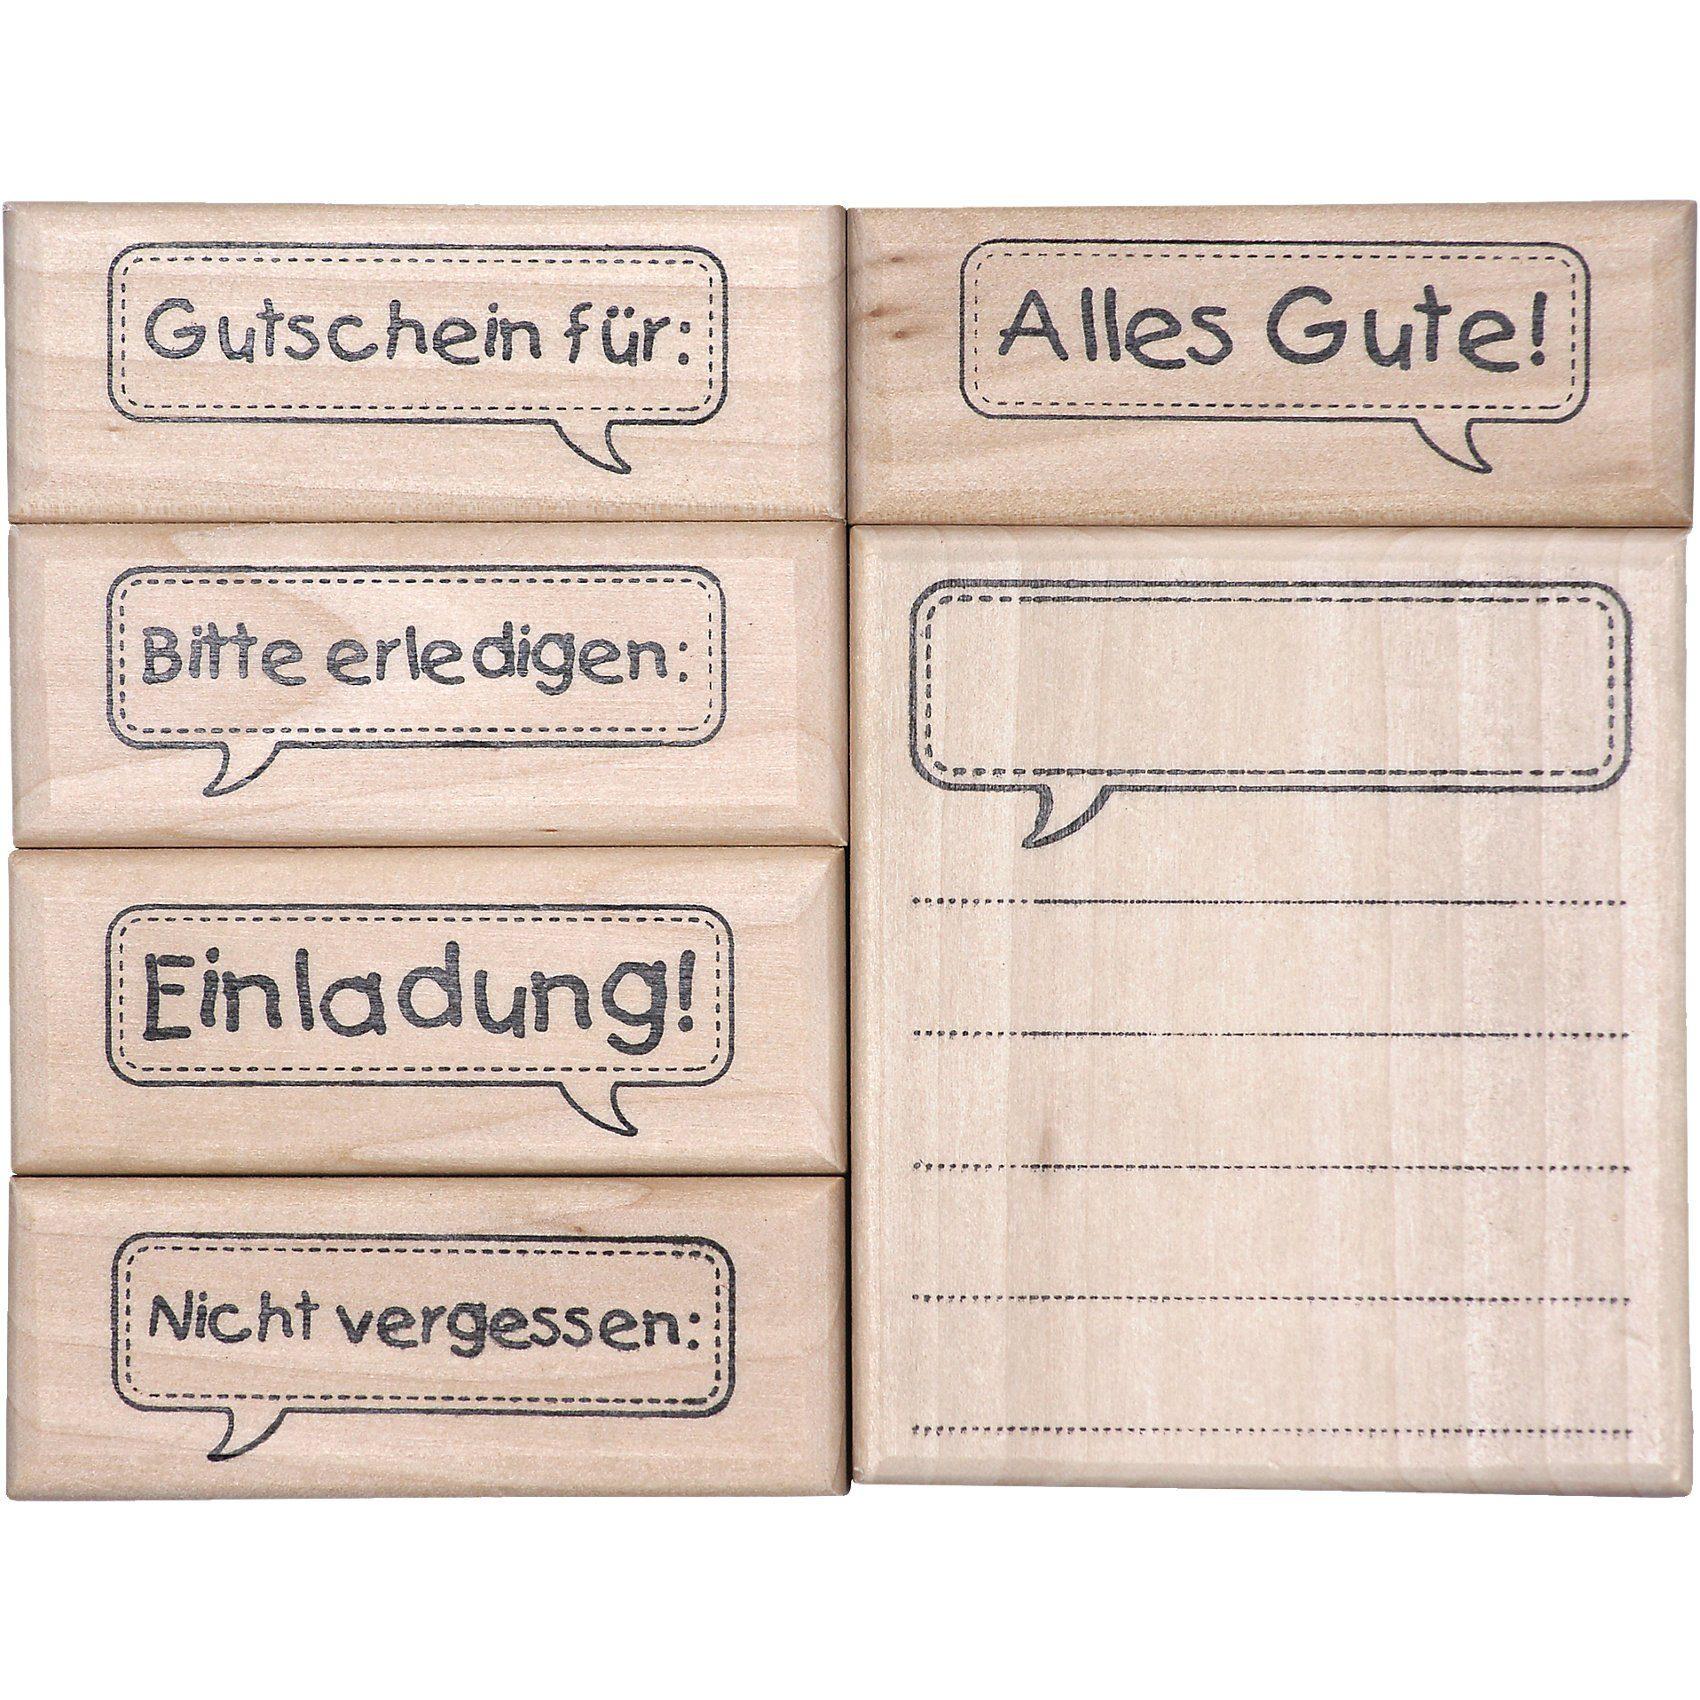 SUNNYSUE Holzstempelset Sprechblasenpost, 6-tlg.